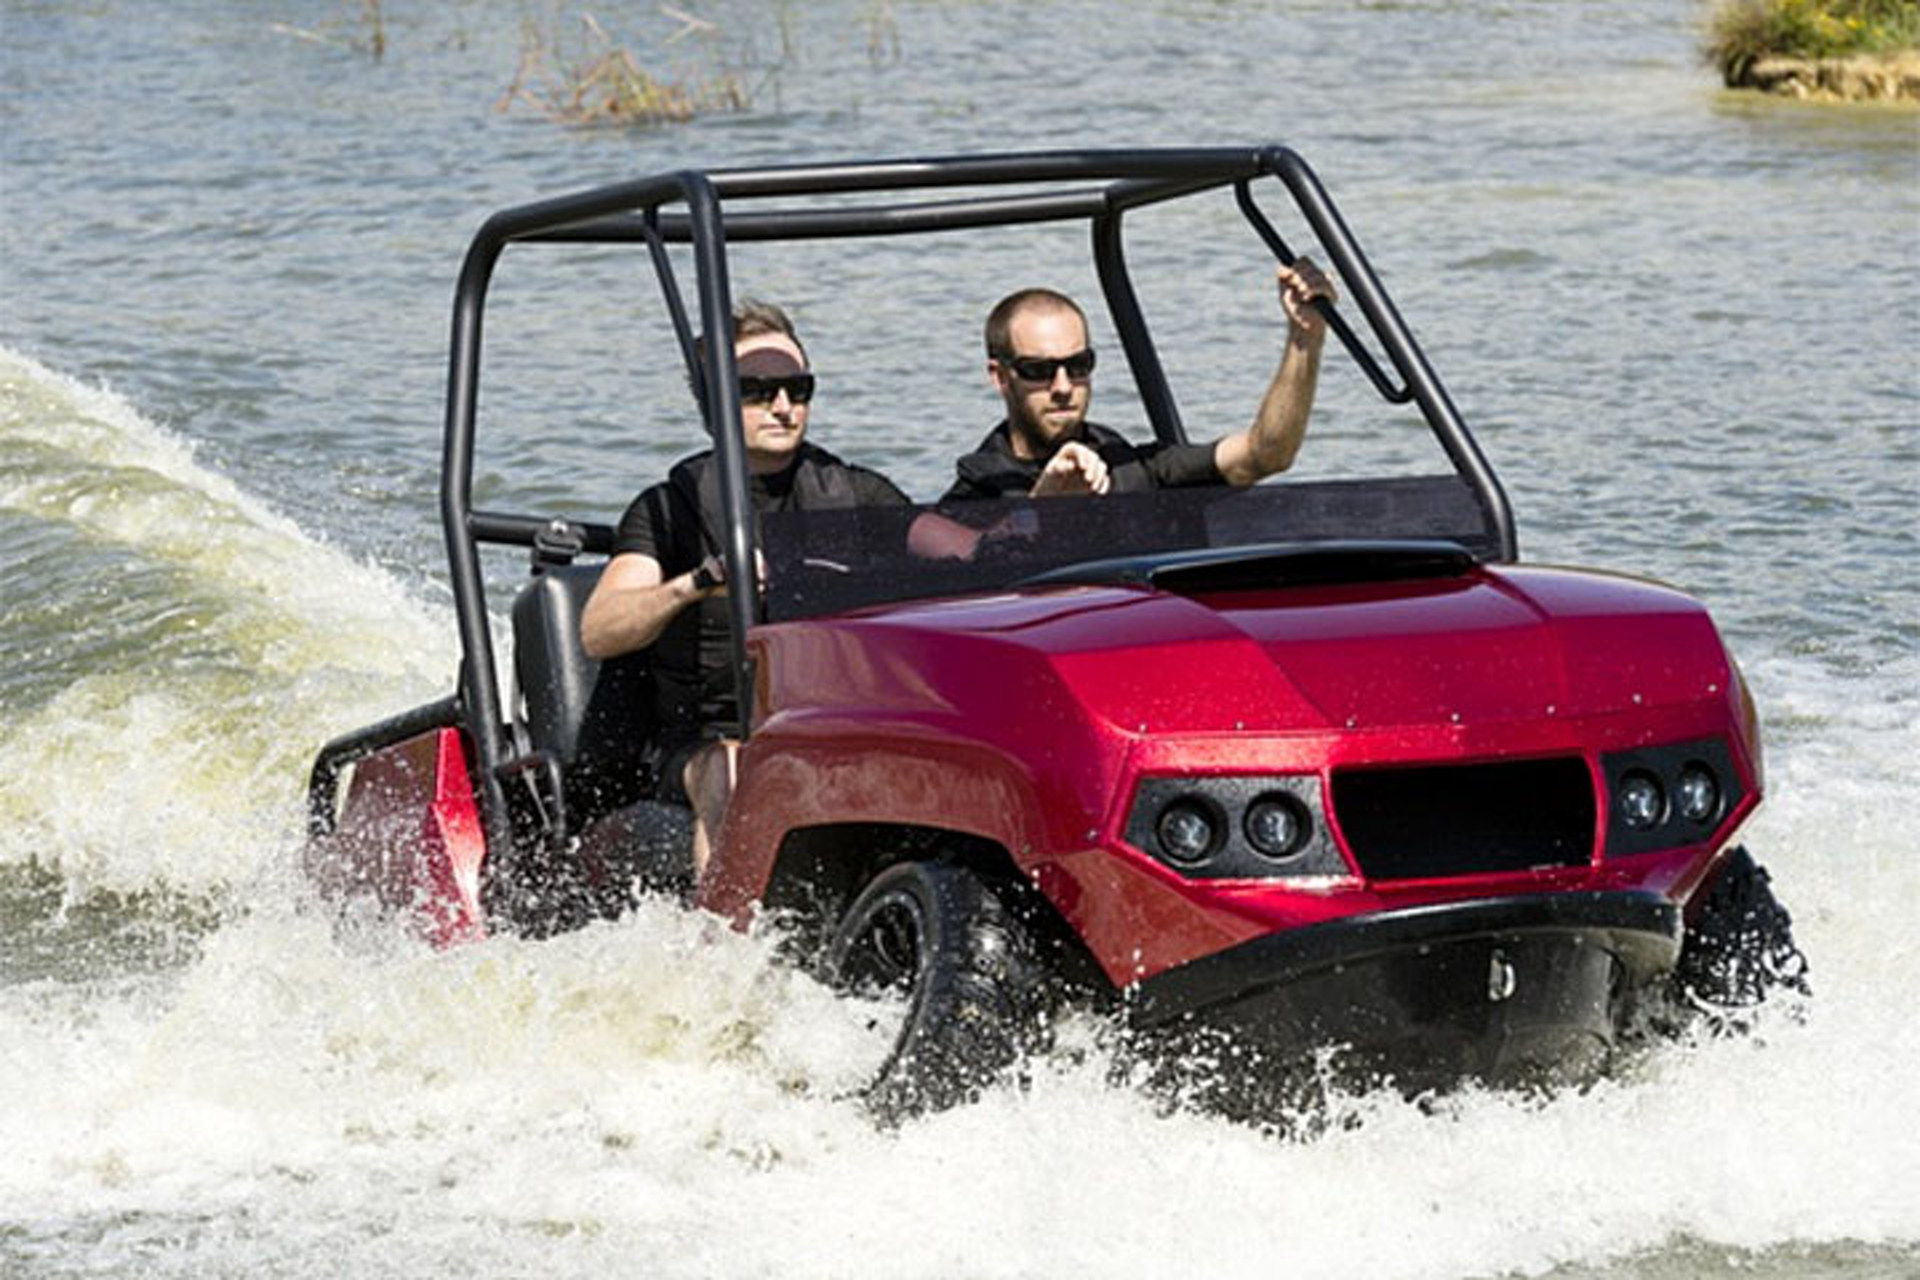 Gibbs Quadski Has Evolved into an Amphibious Bike, Trike, and UTV